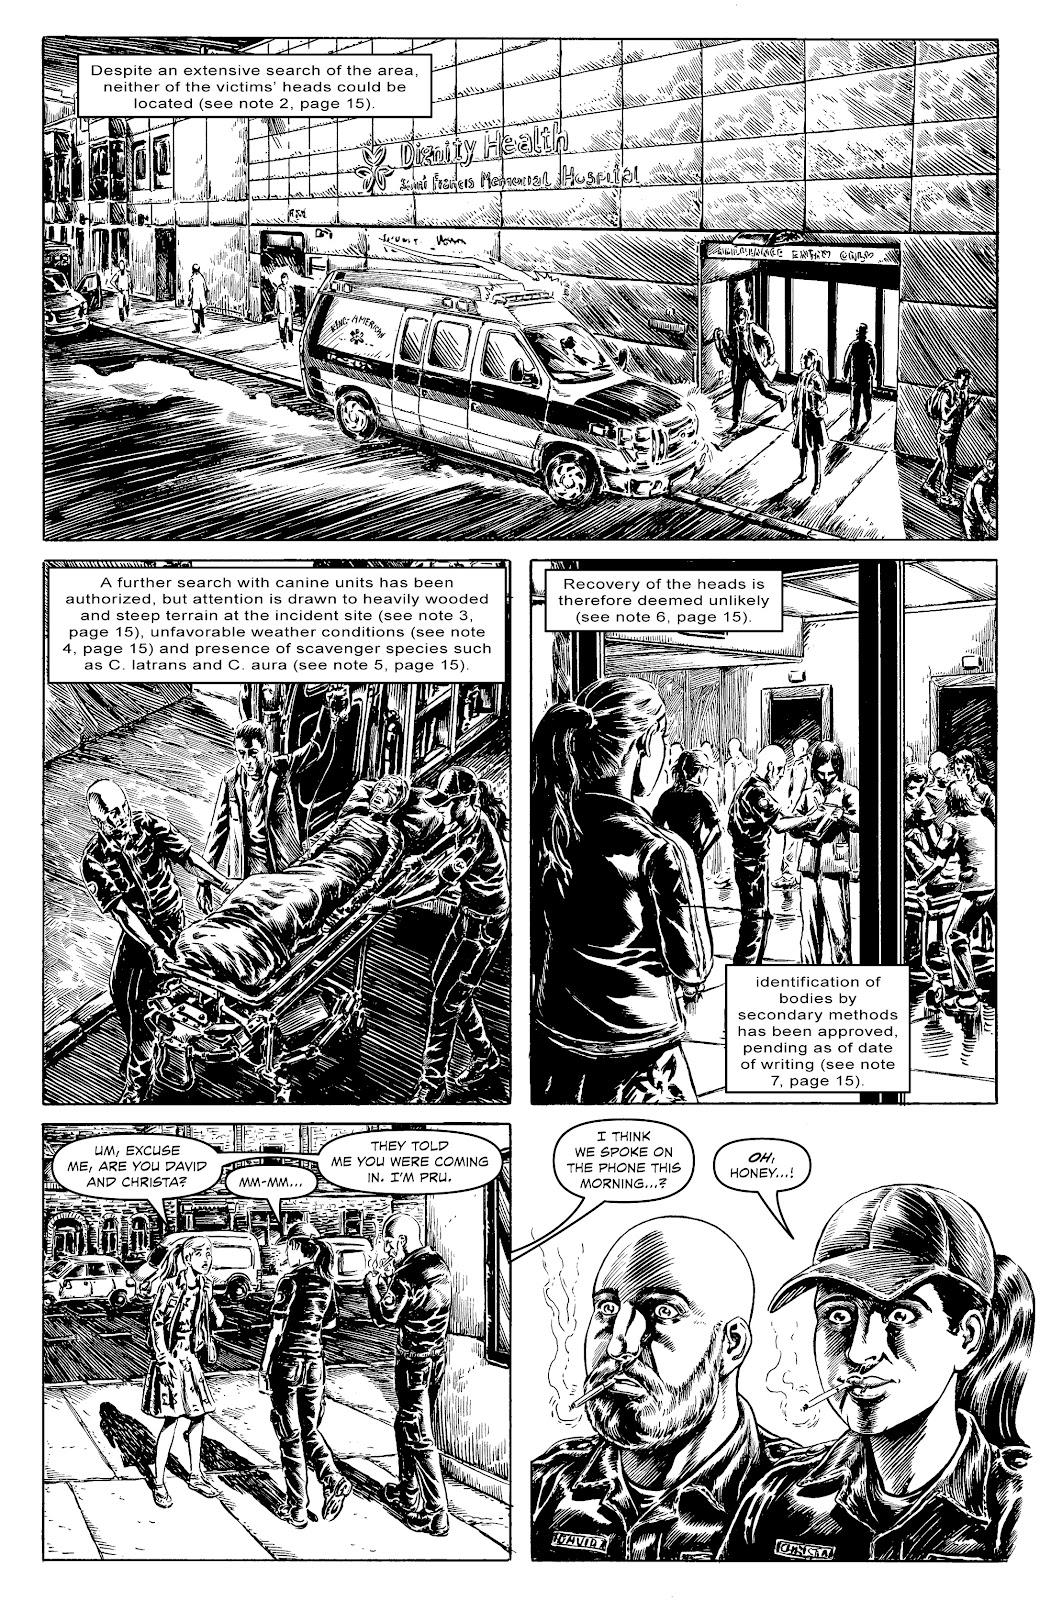 Read online Alan Moore's Cinema Purgatorio comic -  Issue #17 - 17